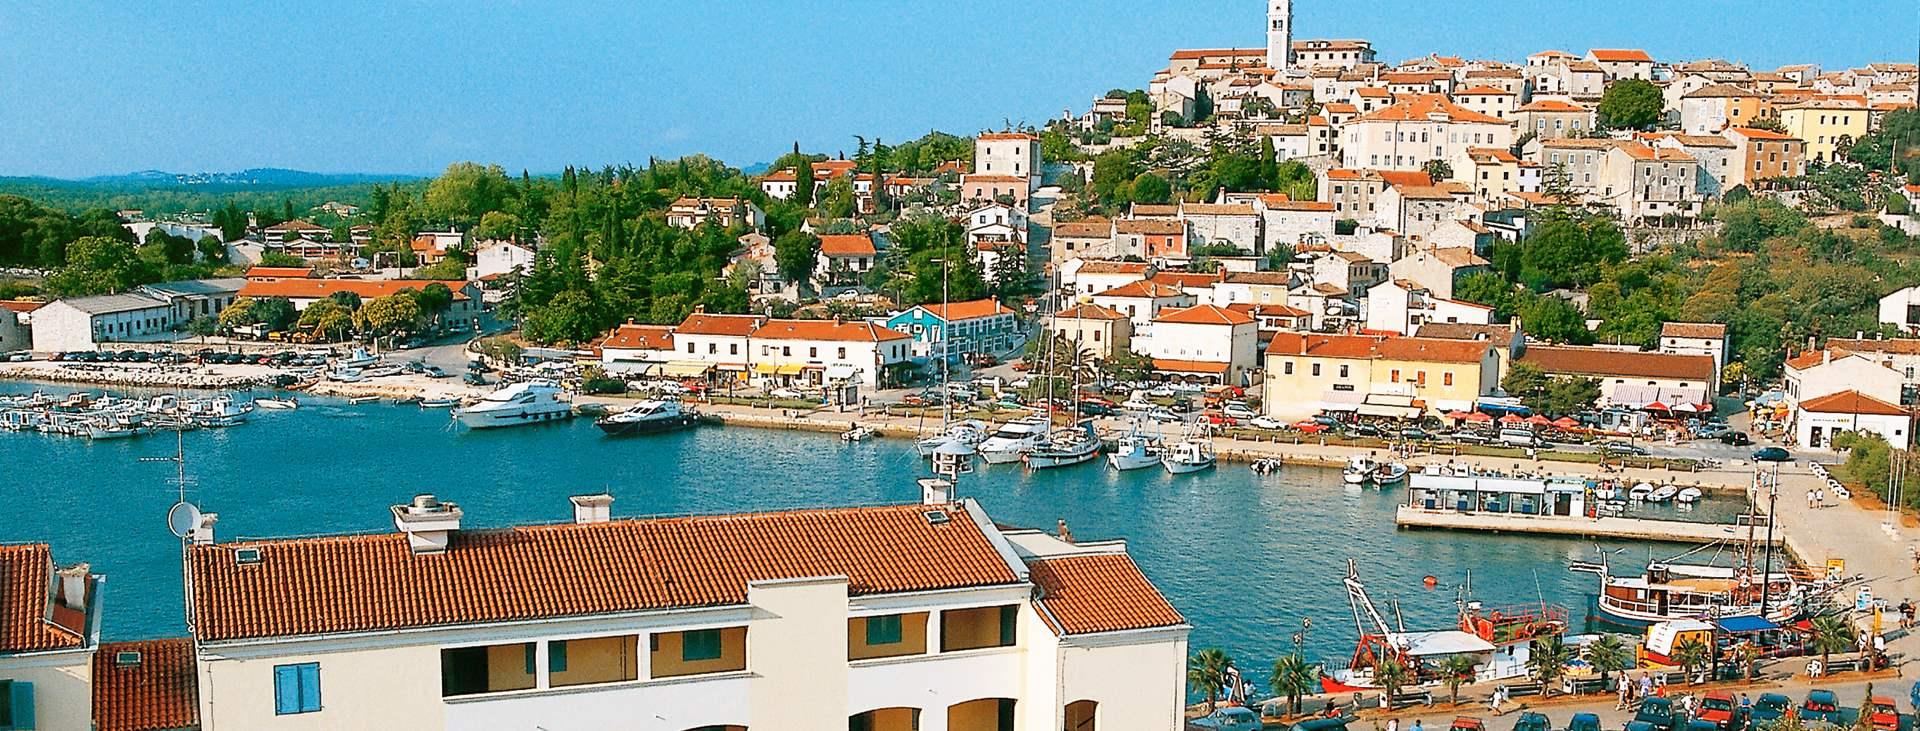 Tjäreborgilta matkat Kroatiaan, Istrian niemimaalle ja kohteena Vrsar